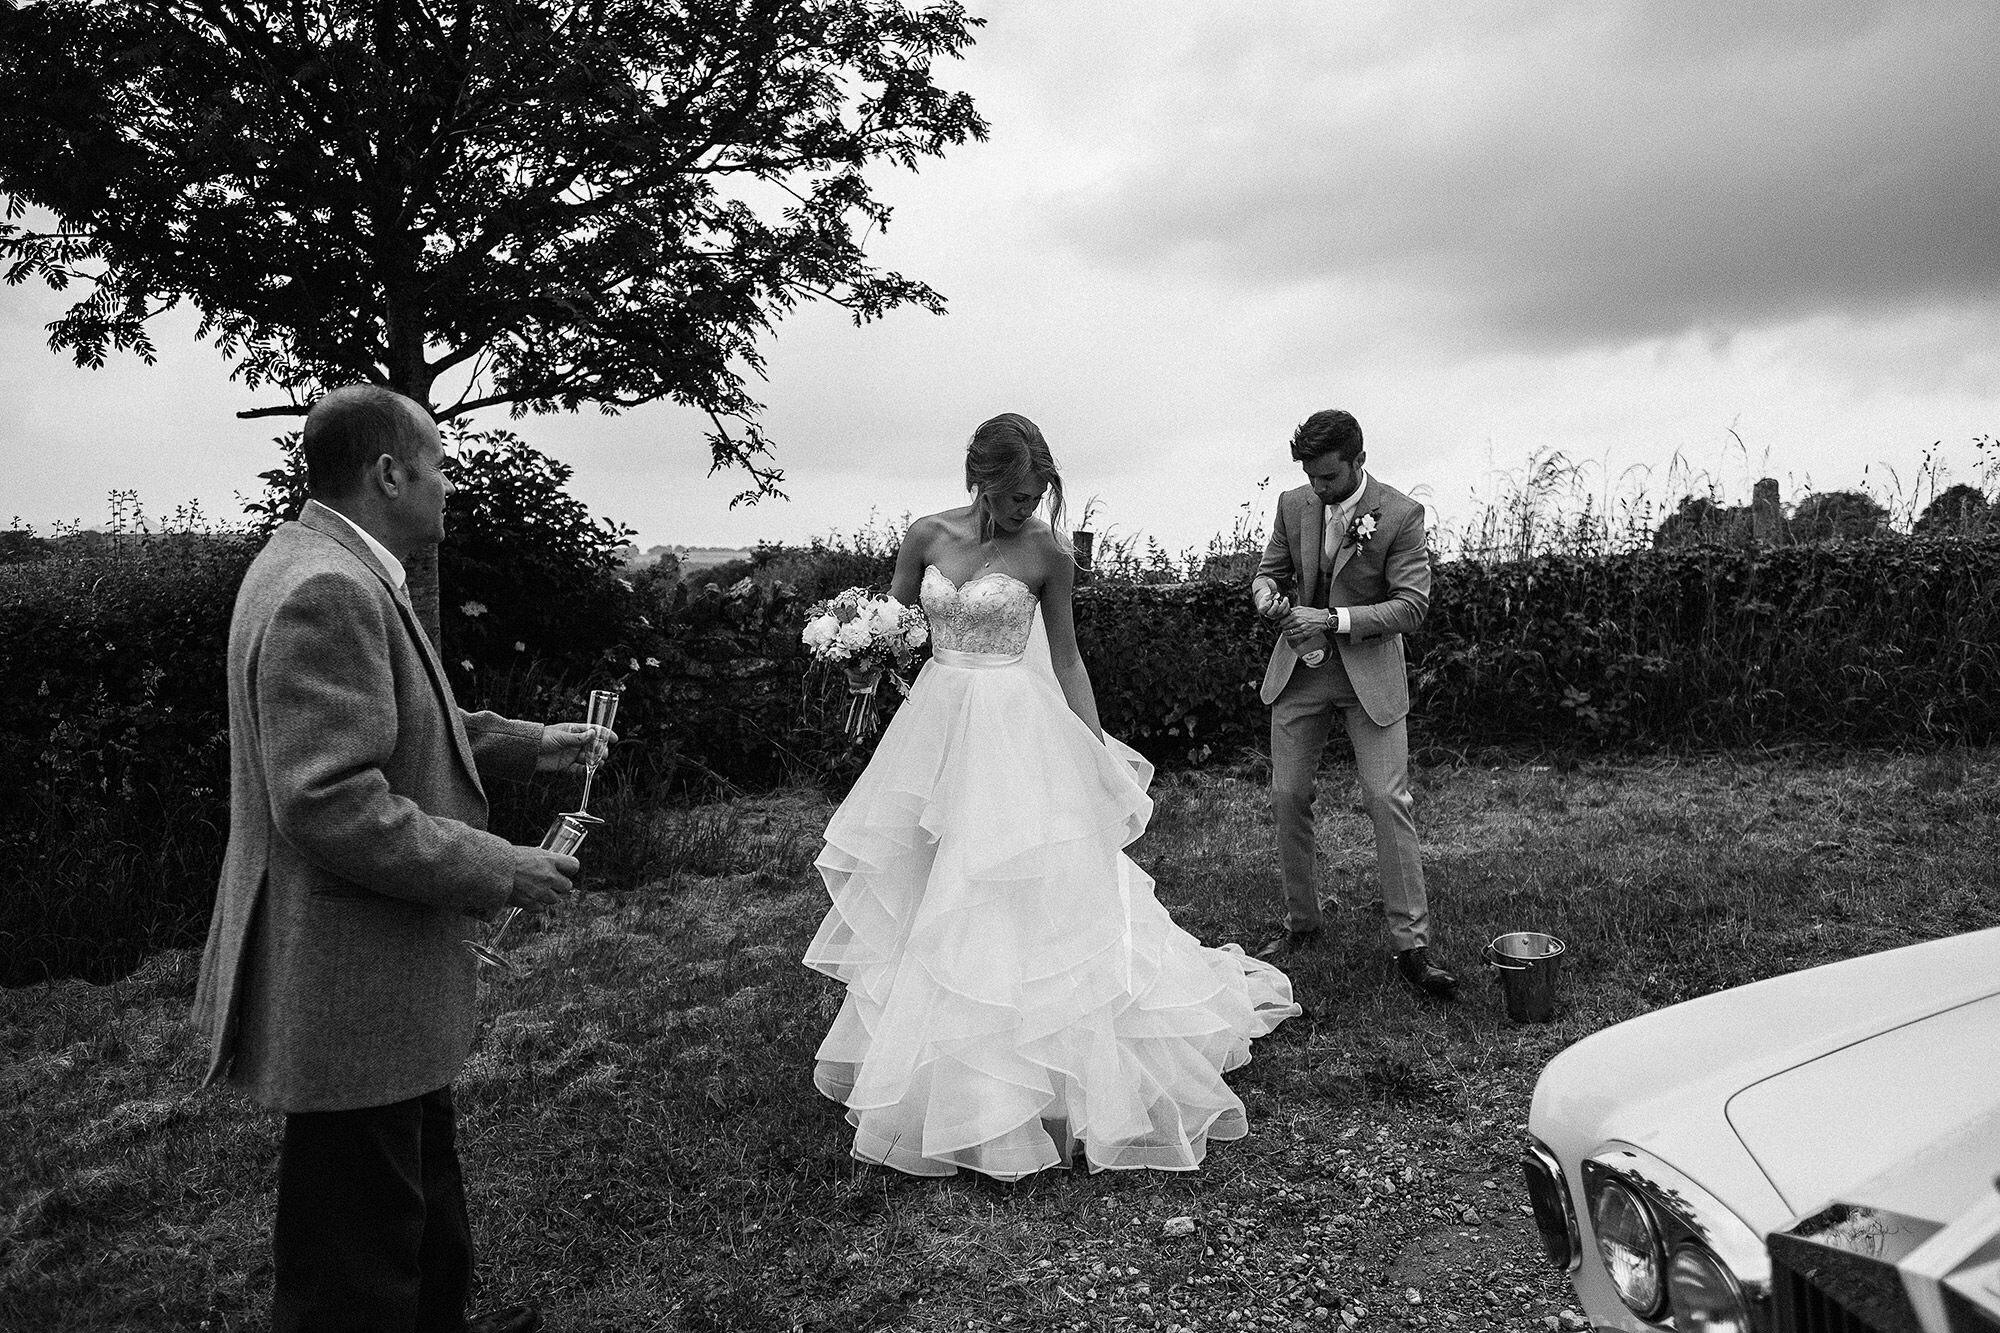 taisy-matthew-wed-2016-0389